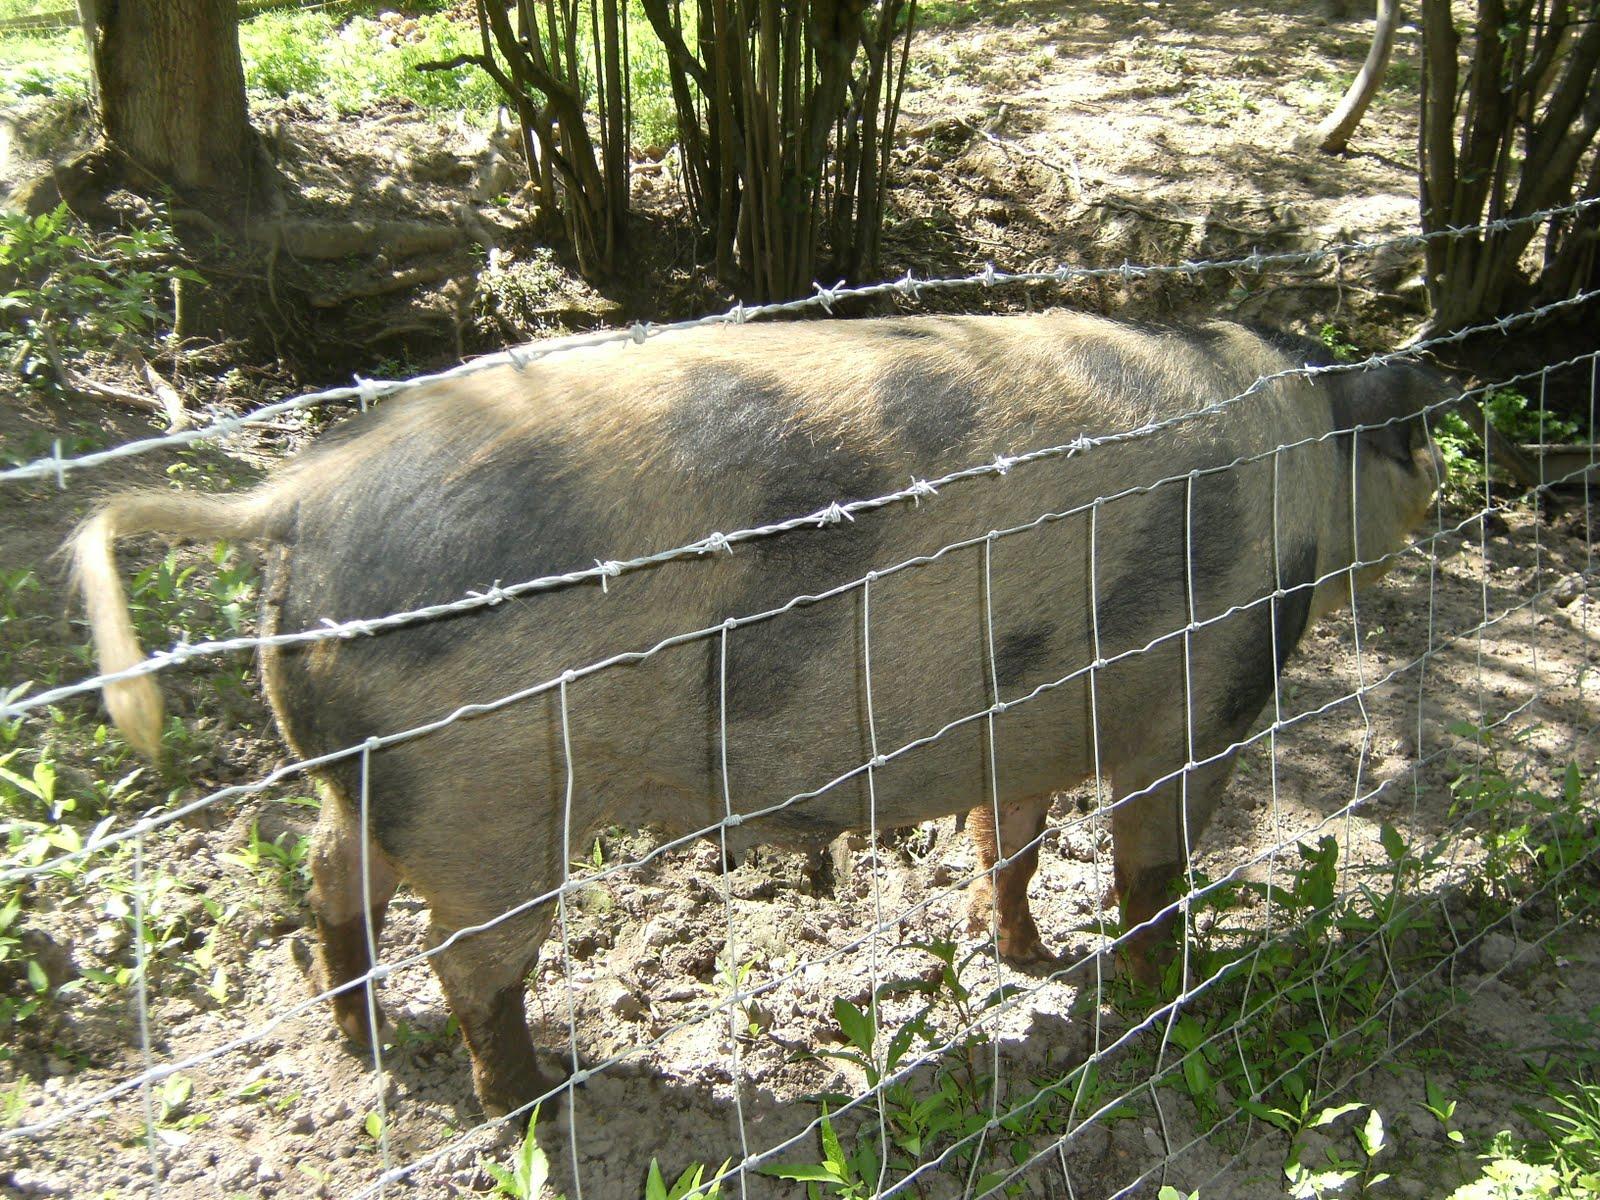 1006160023 Farmyard pig, Trugger's Farm